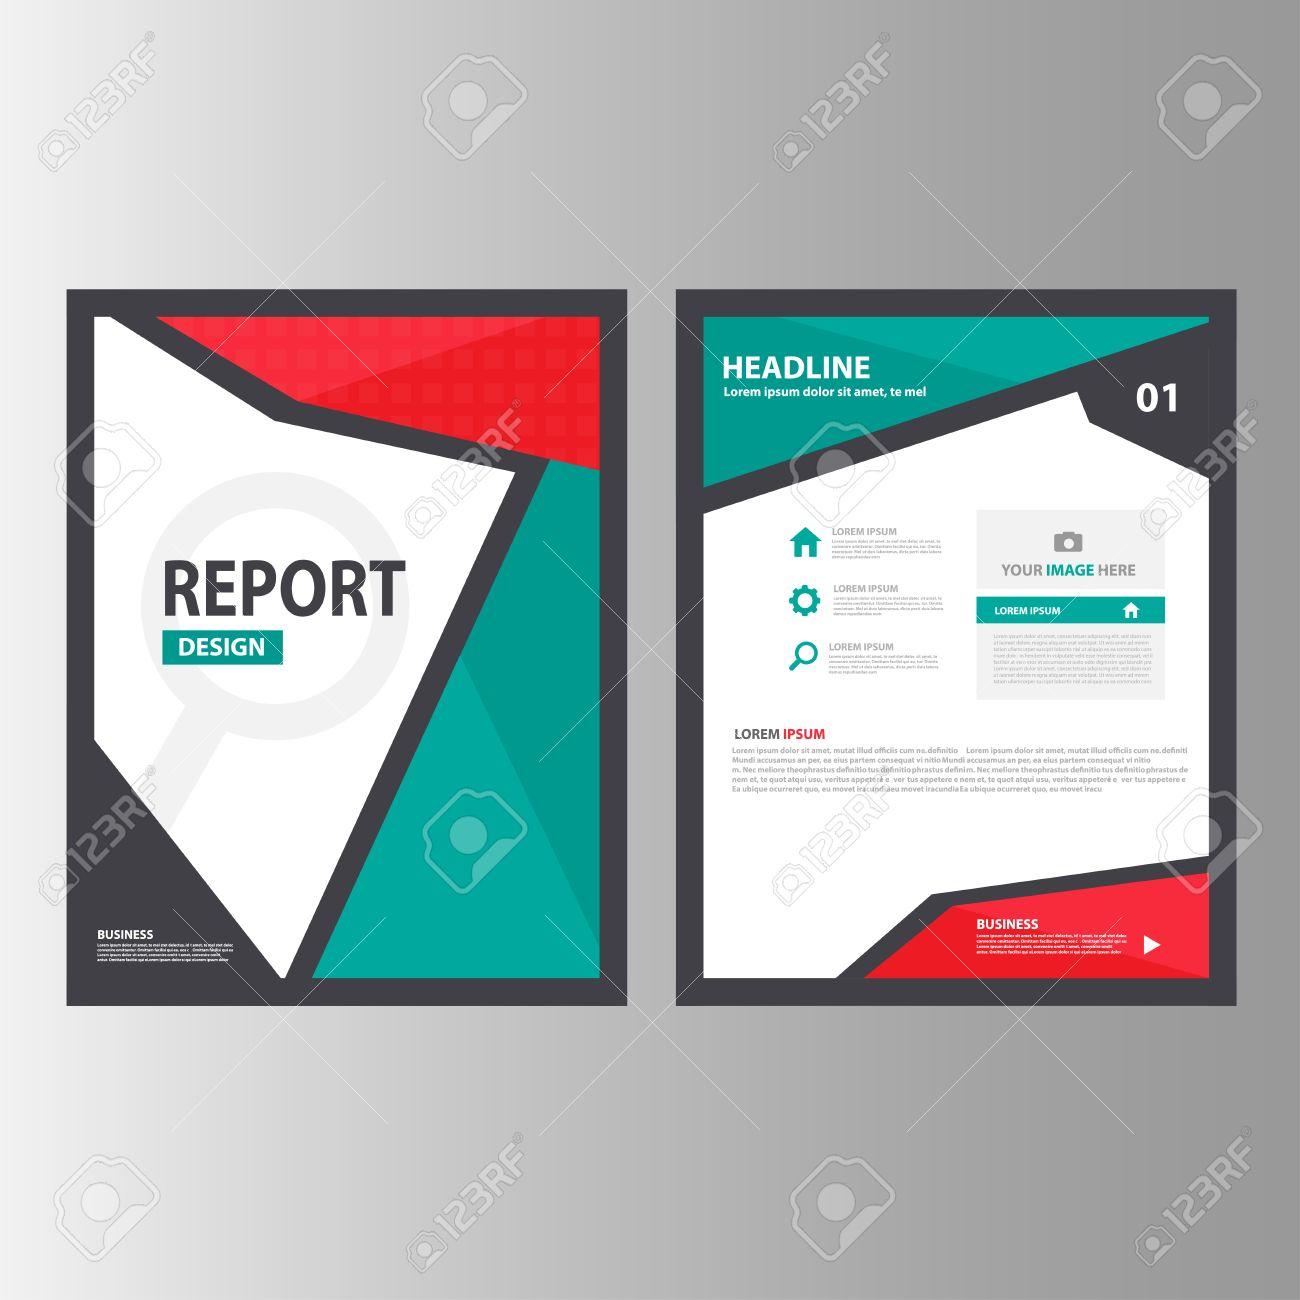 red green black annual report multipurpose infographic elements red green black annual report multipurpose infographic elements and icon presentation template flat design set for